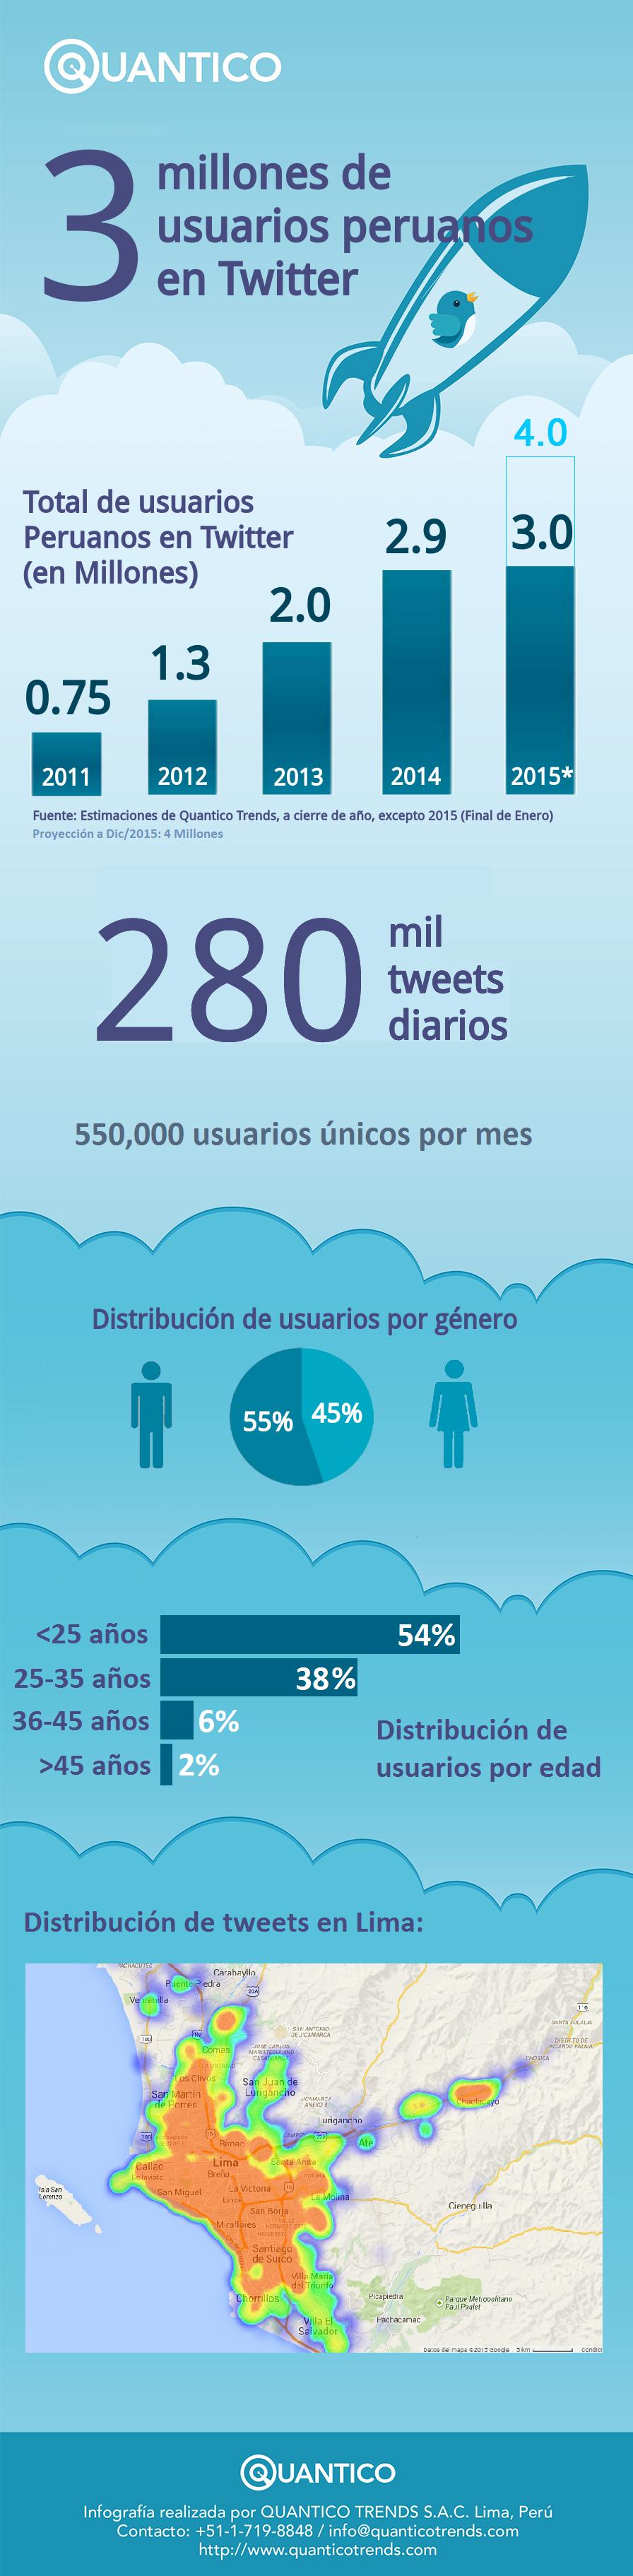 Infografia-Twitter-Peru-2015